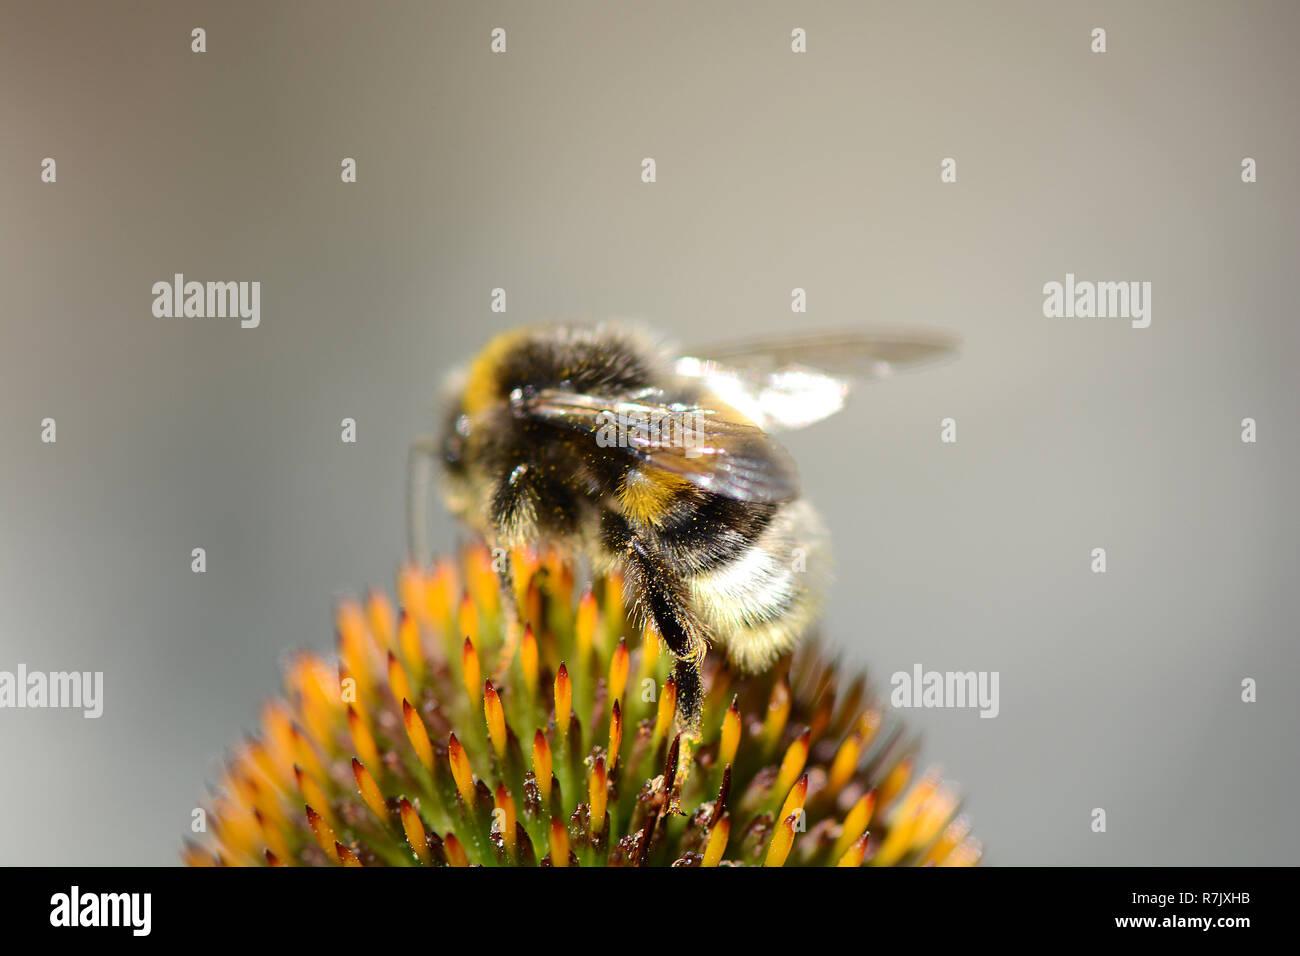 Deep Focus of Working Honey Bee. Close up - Stock Image